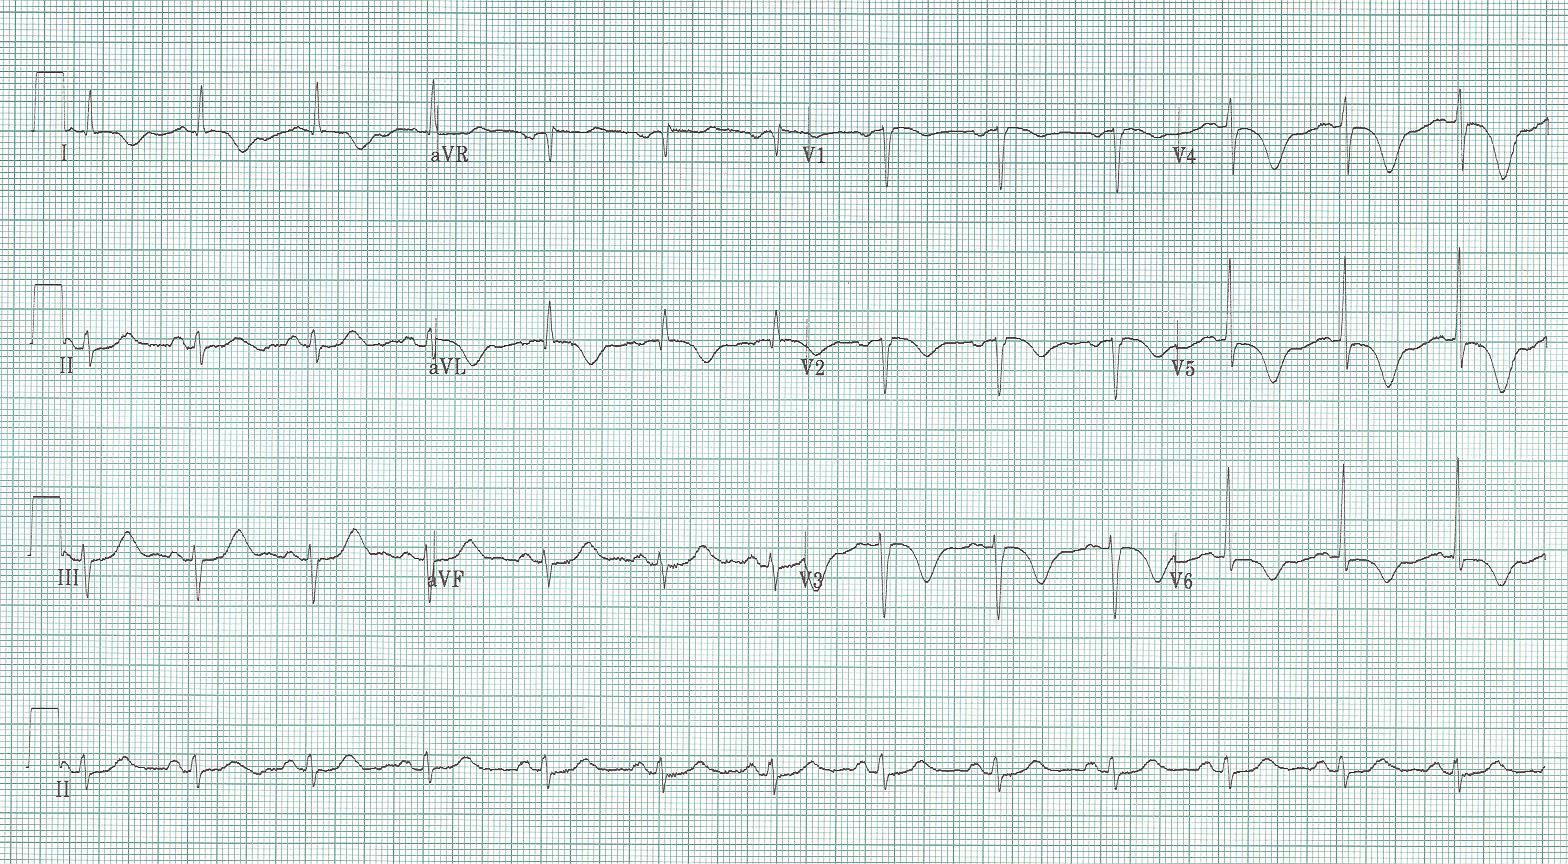 45 - Takotsubo cardiomyopathy